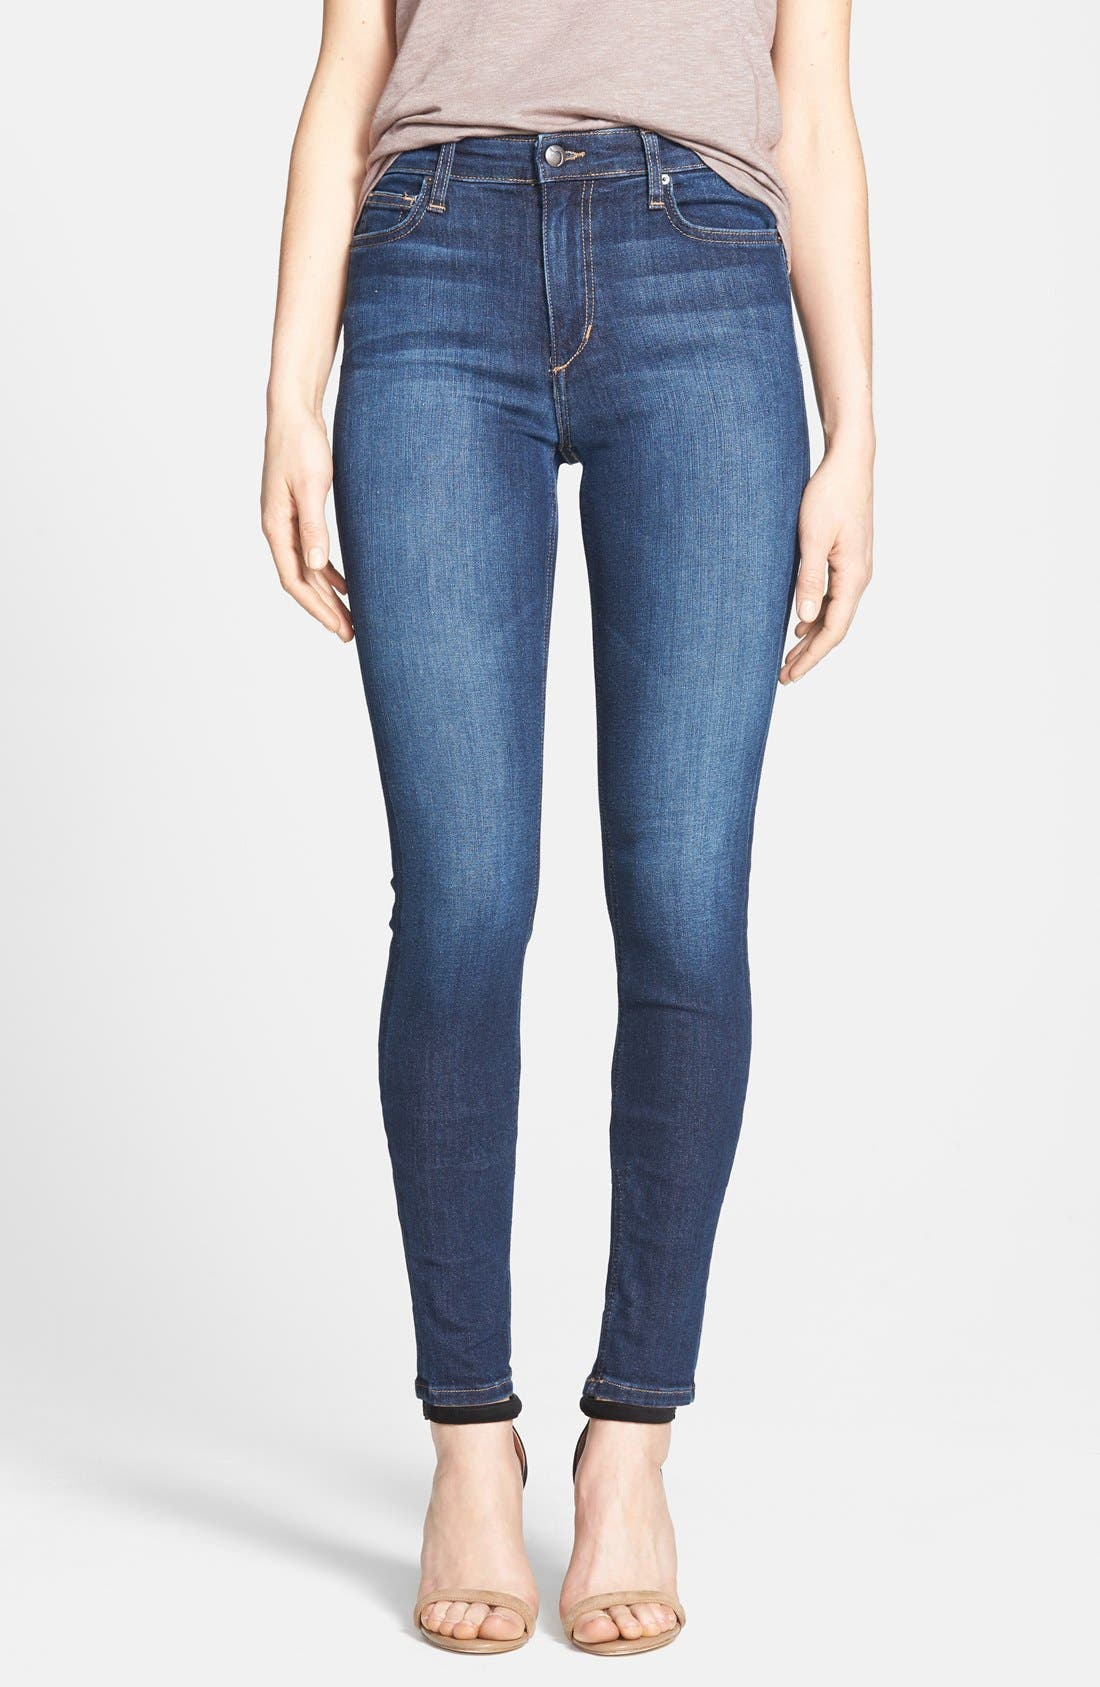 Main Image - Joe's 'Flawless' High Rise Skinny Jeans (Acadia)